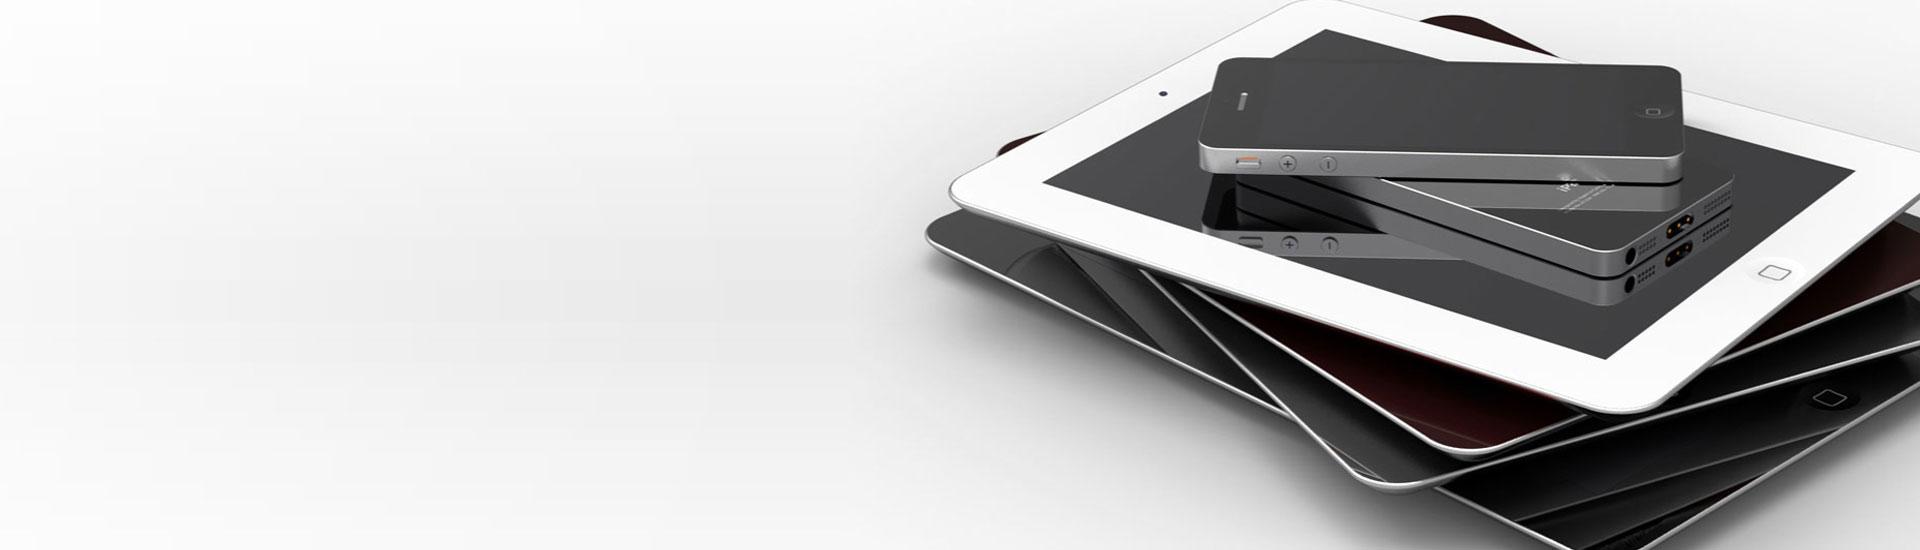 apple-ipad-repair-lebanon-webvision-it-solutions